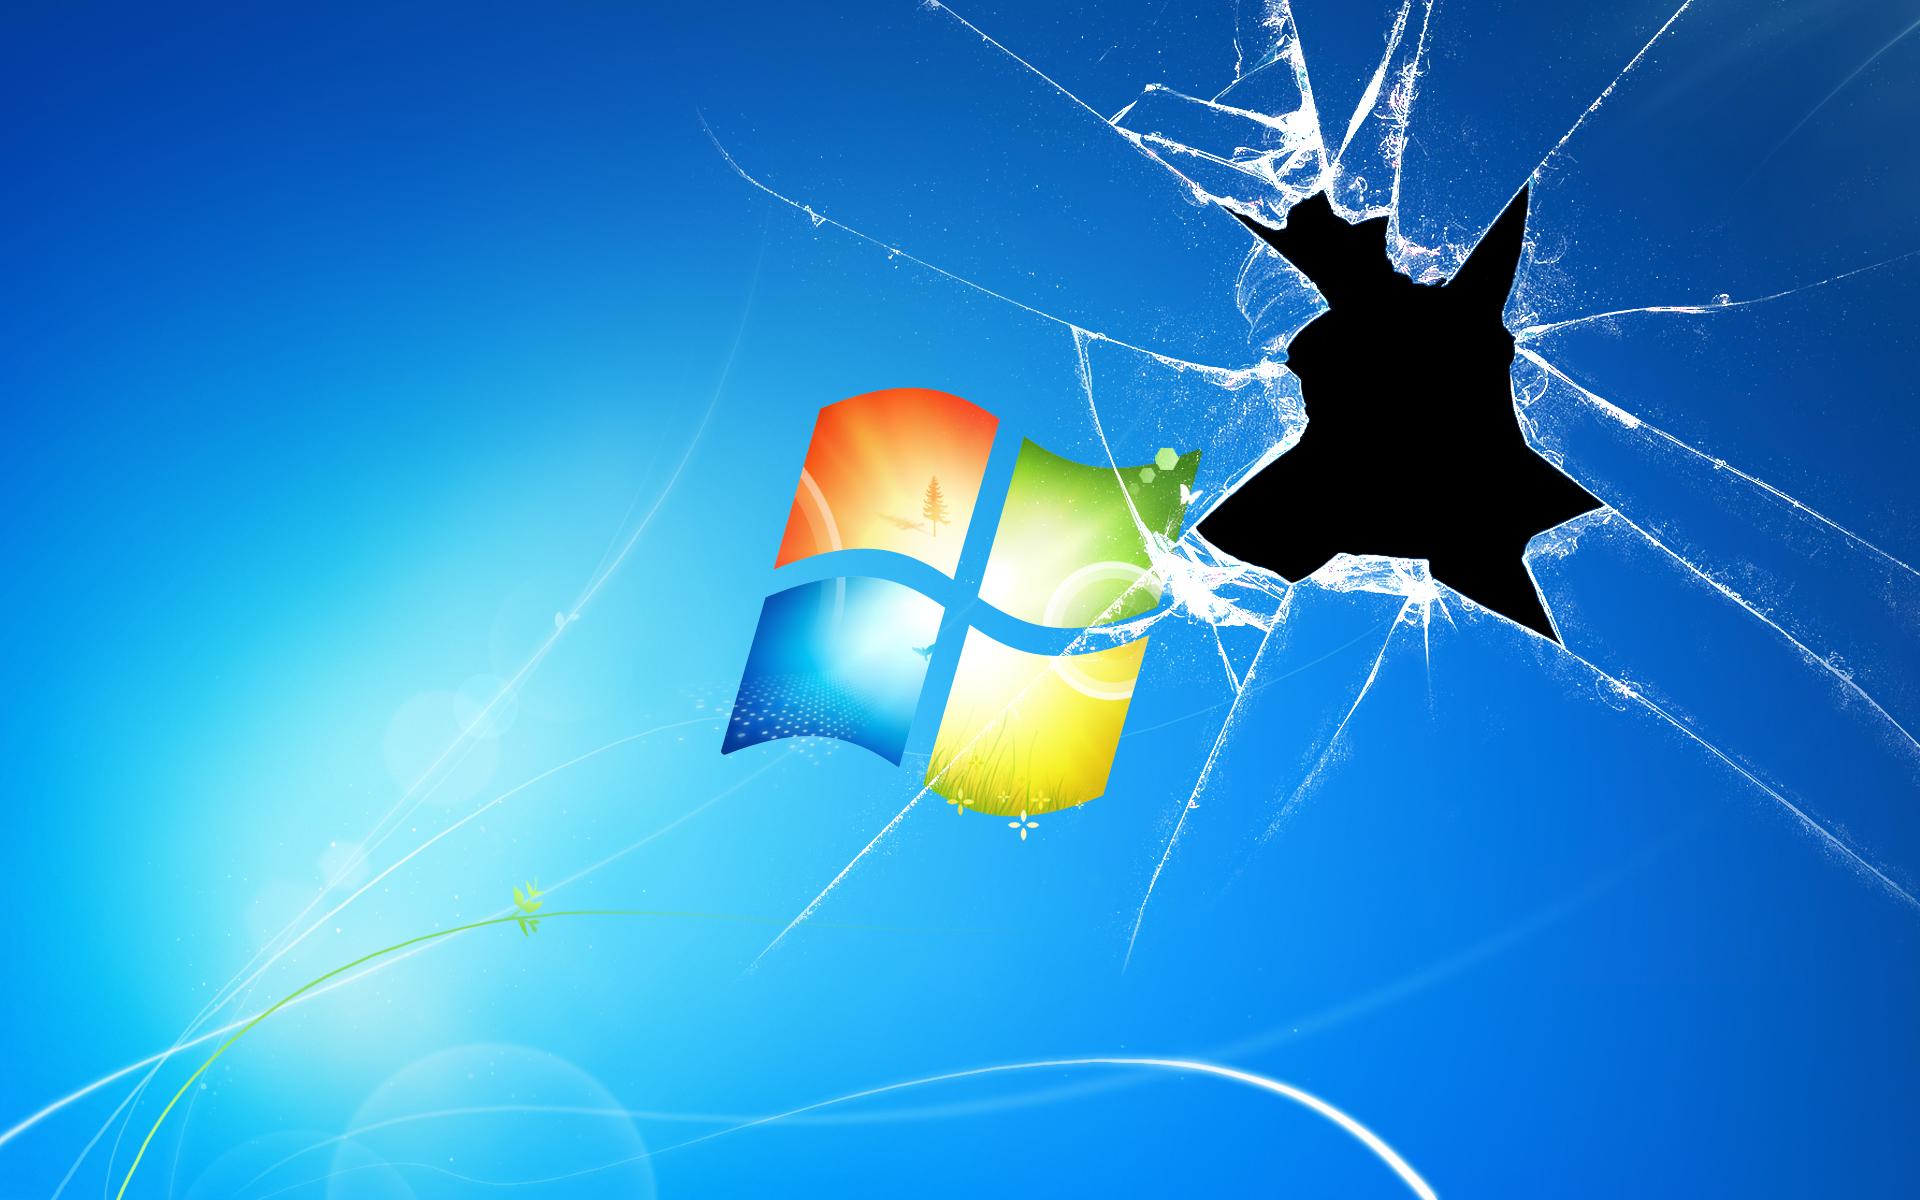 Broken Windows 7 by smuggle559